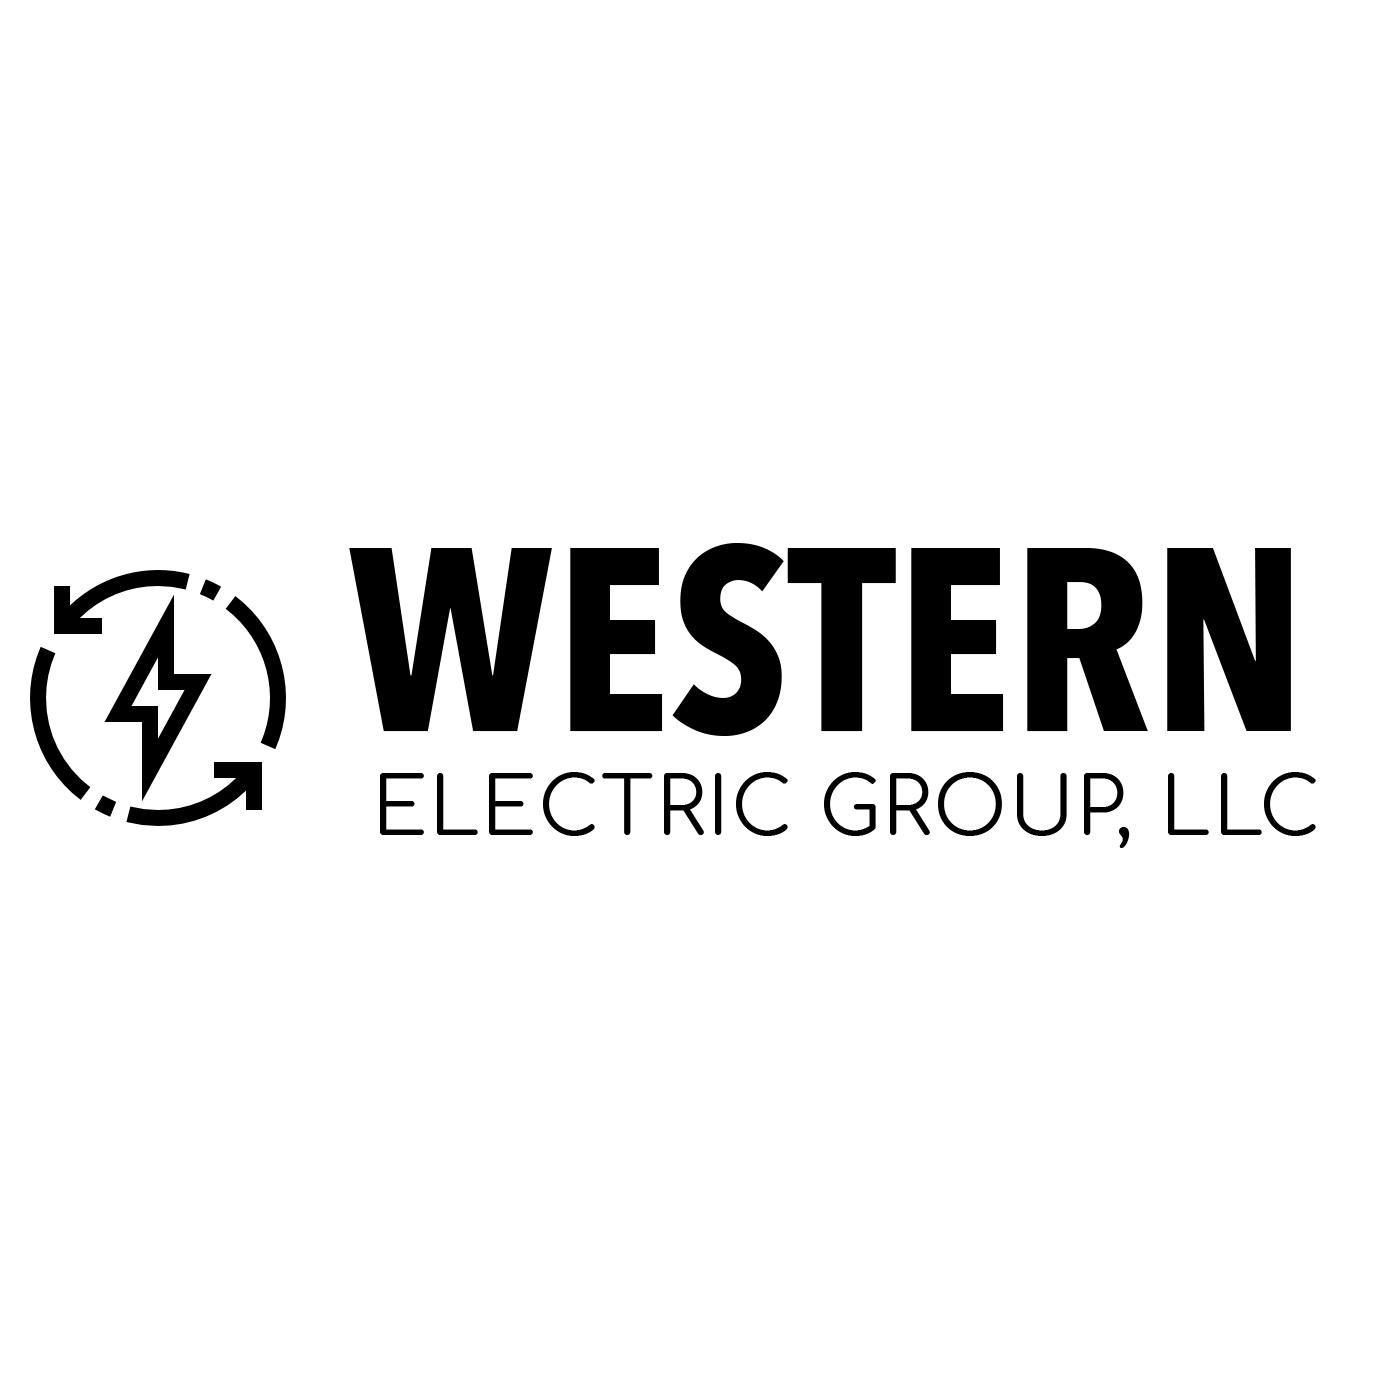 Western Electric Group, LLC